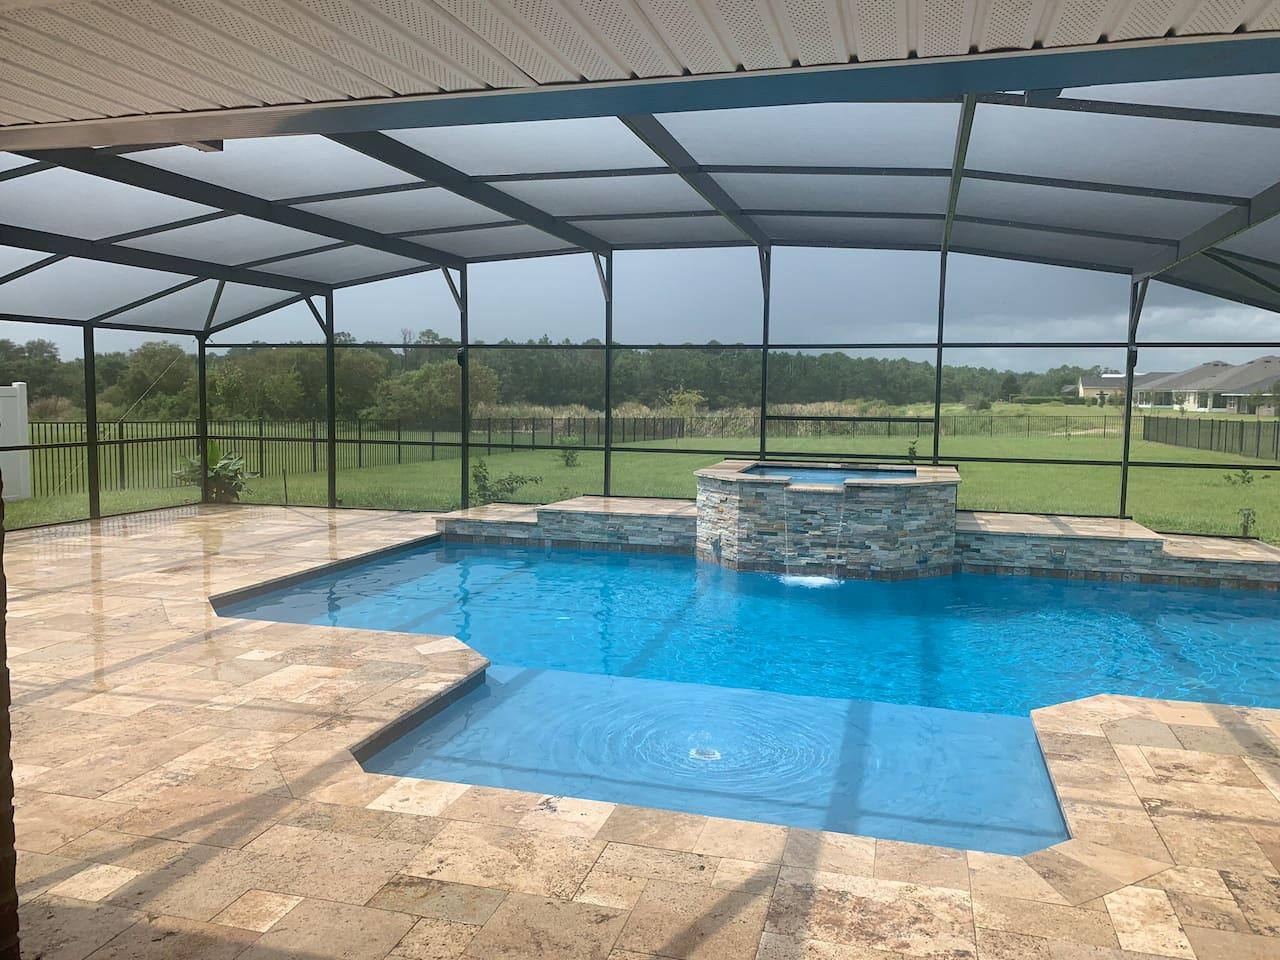 Pool Room and Hot Tub